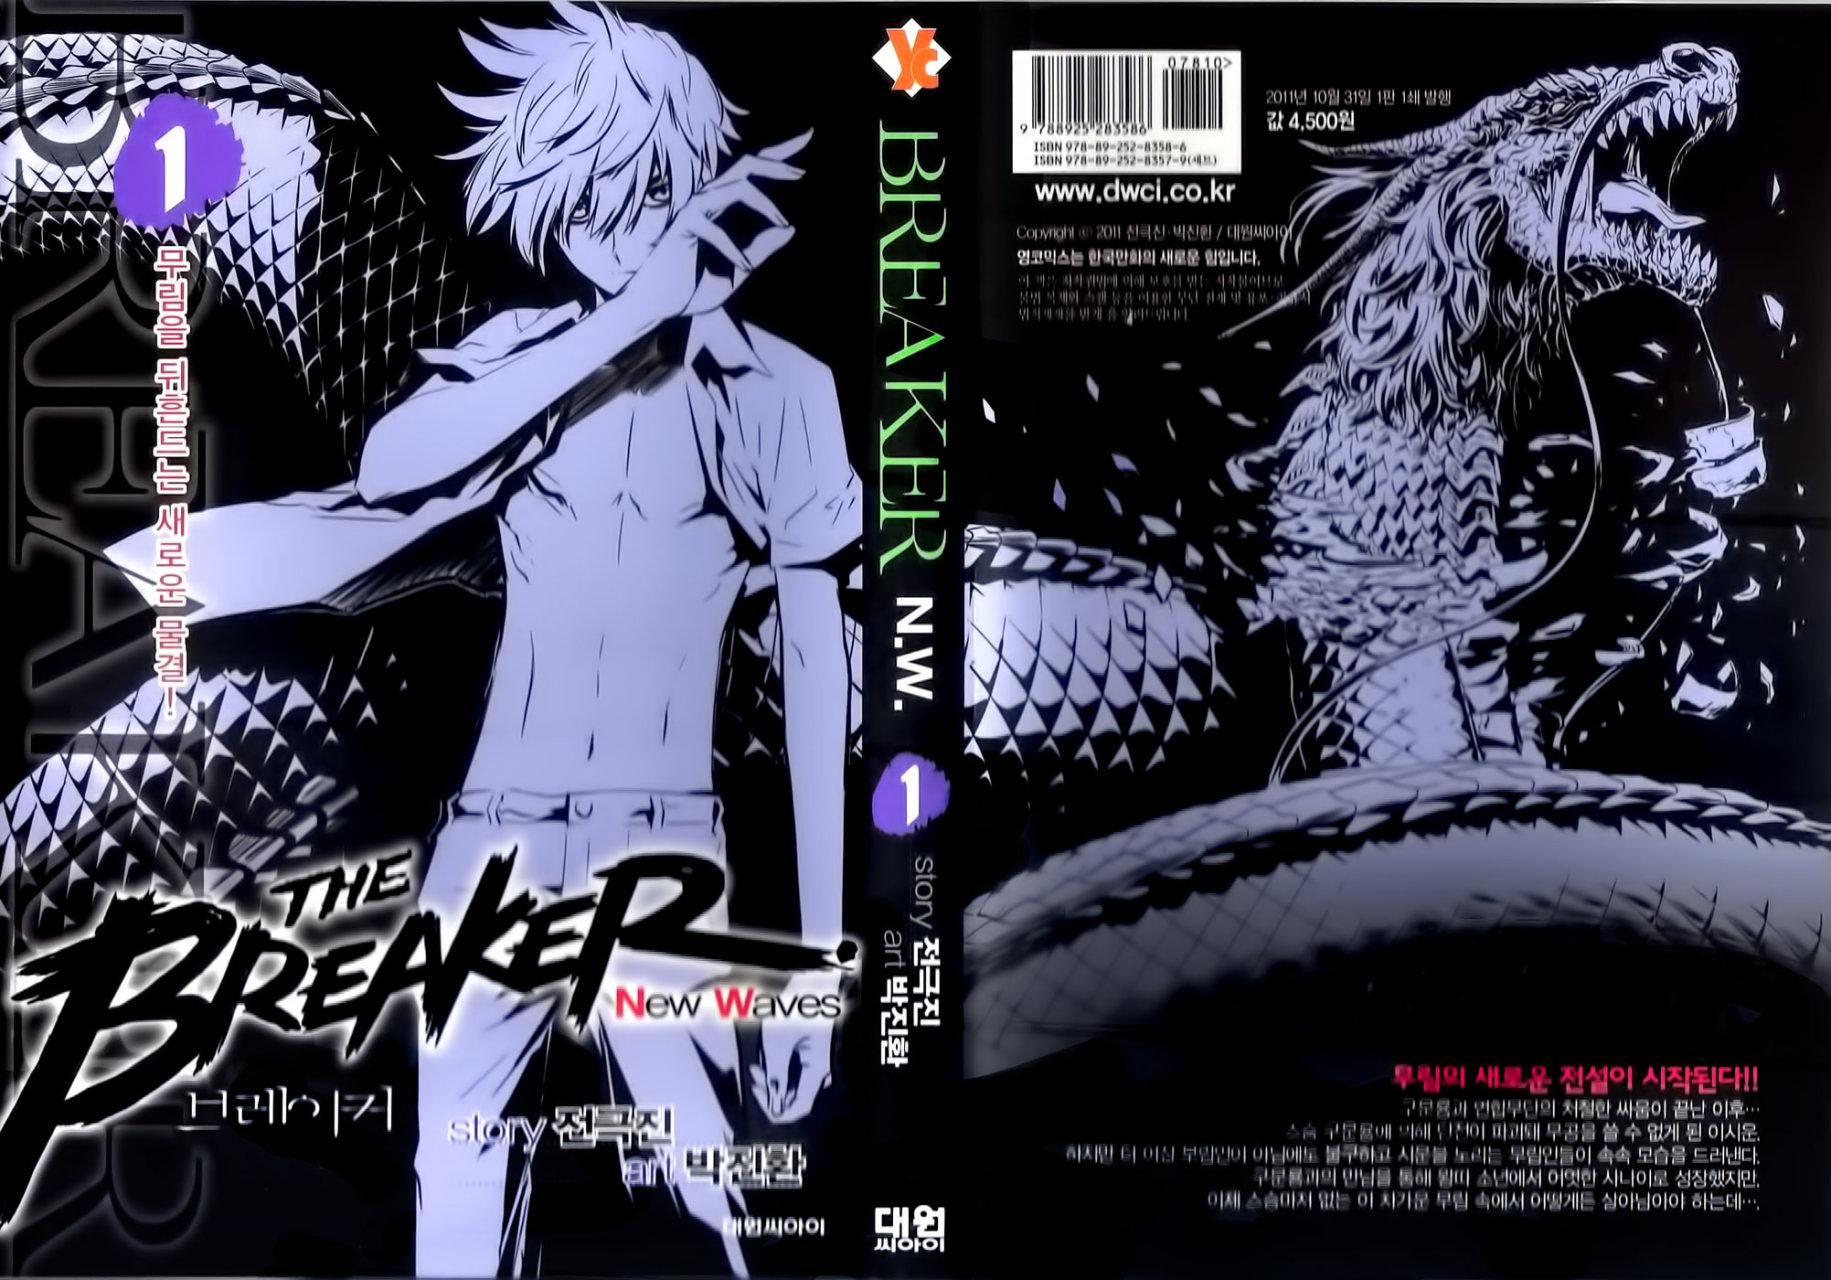 https://nine.mangadogs.com/es_manga/pic8/46/110/934419/b94f73bd89a64970ead711d67d7b0bc6.jpg Page 1